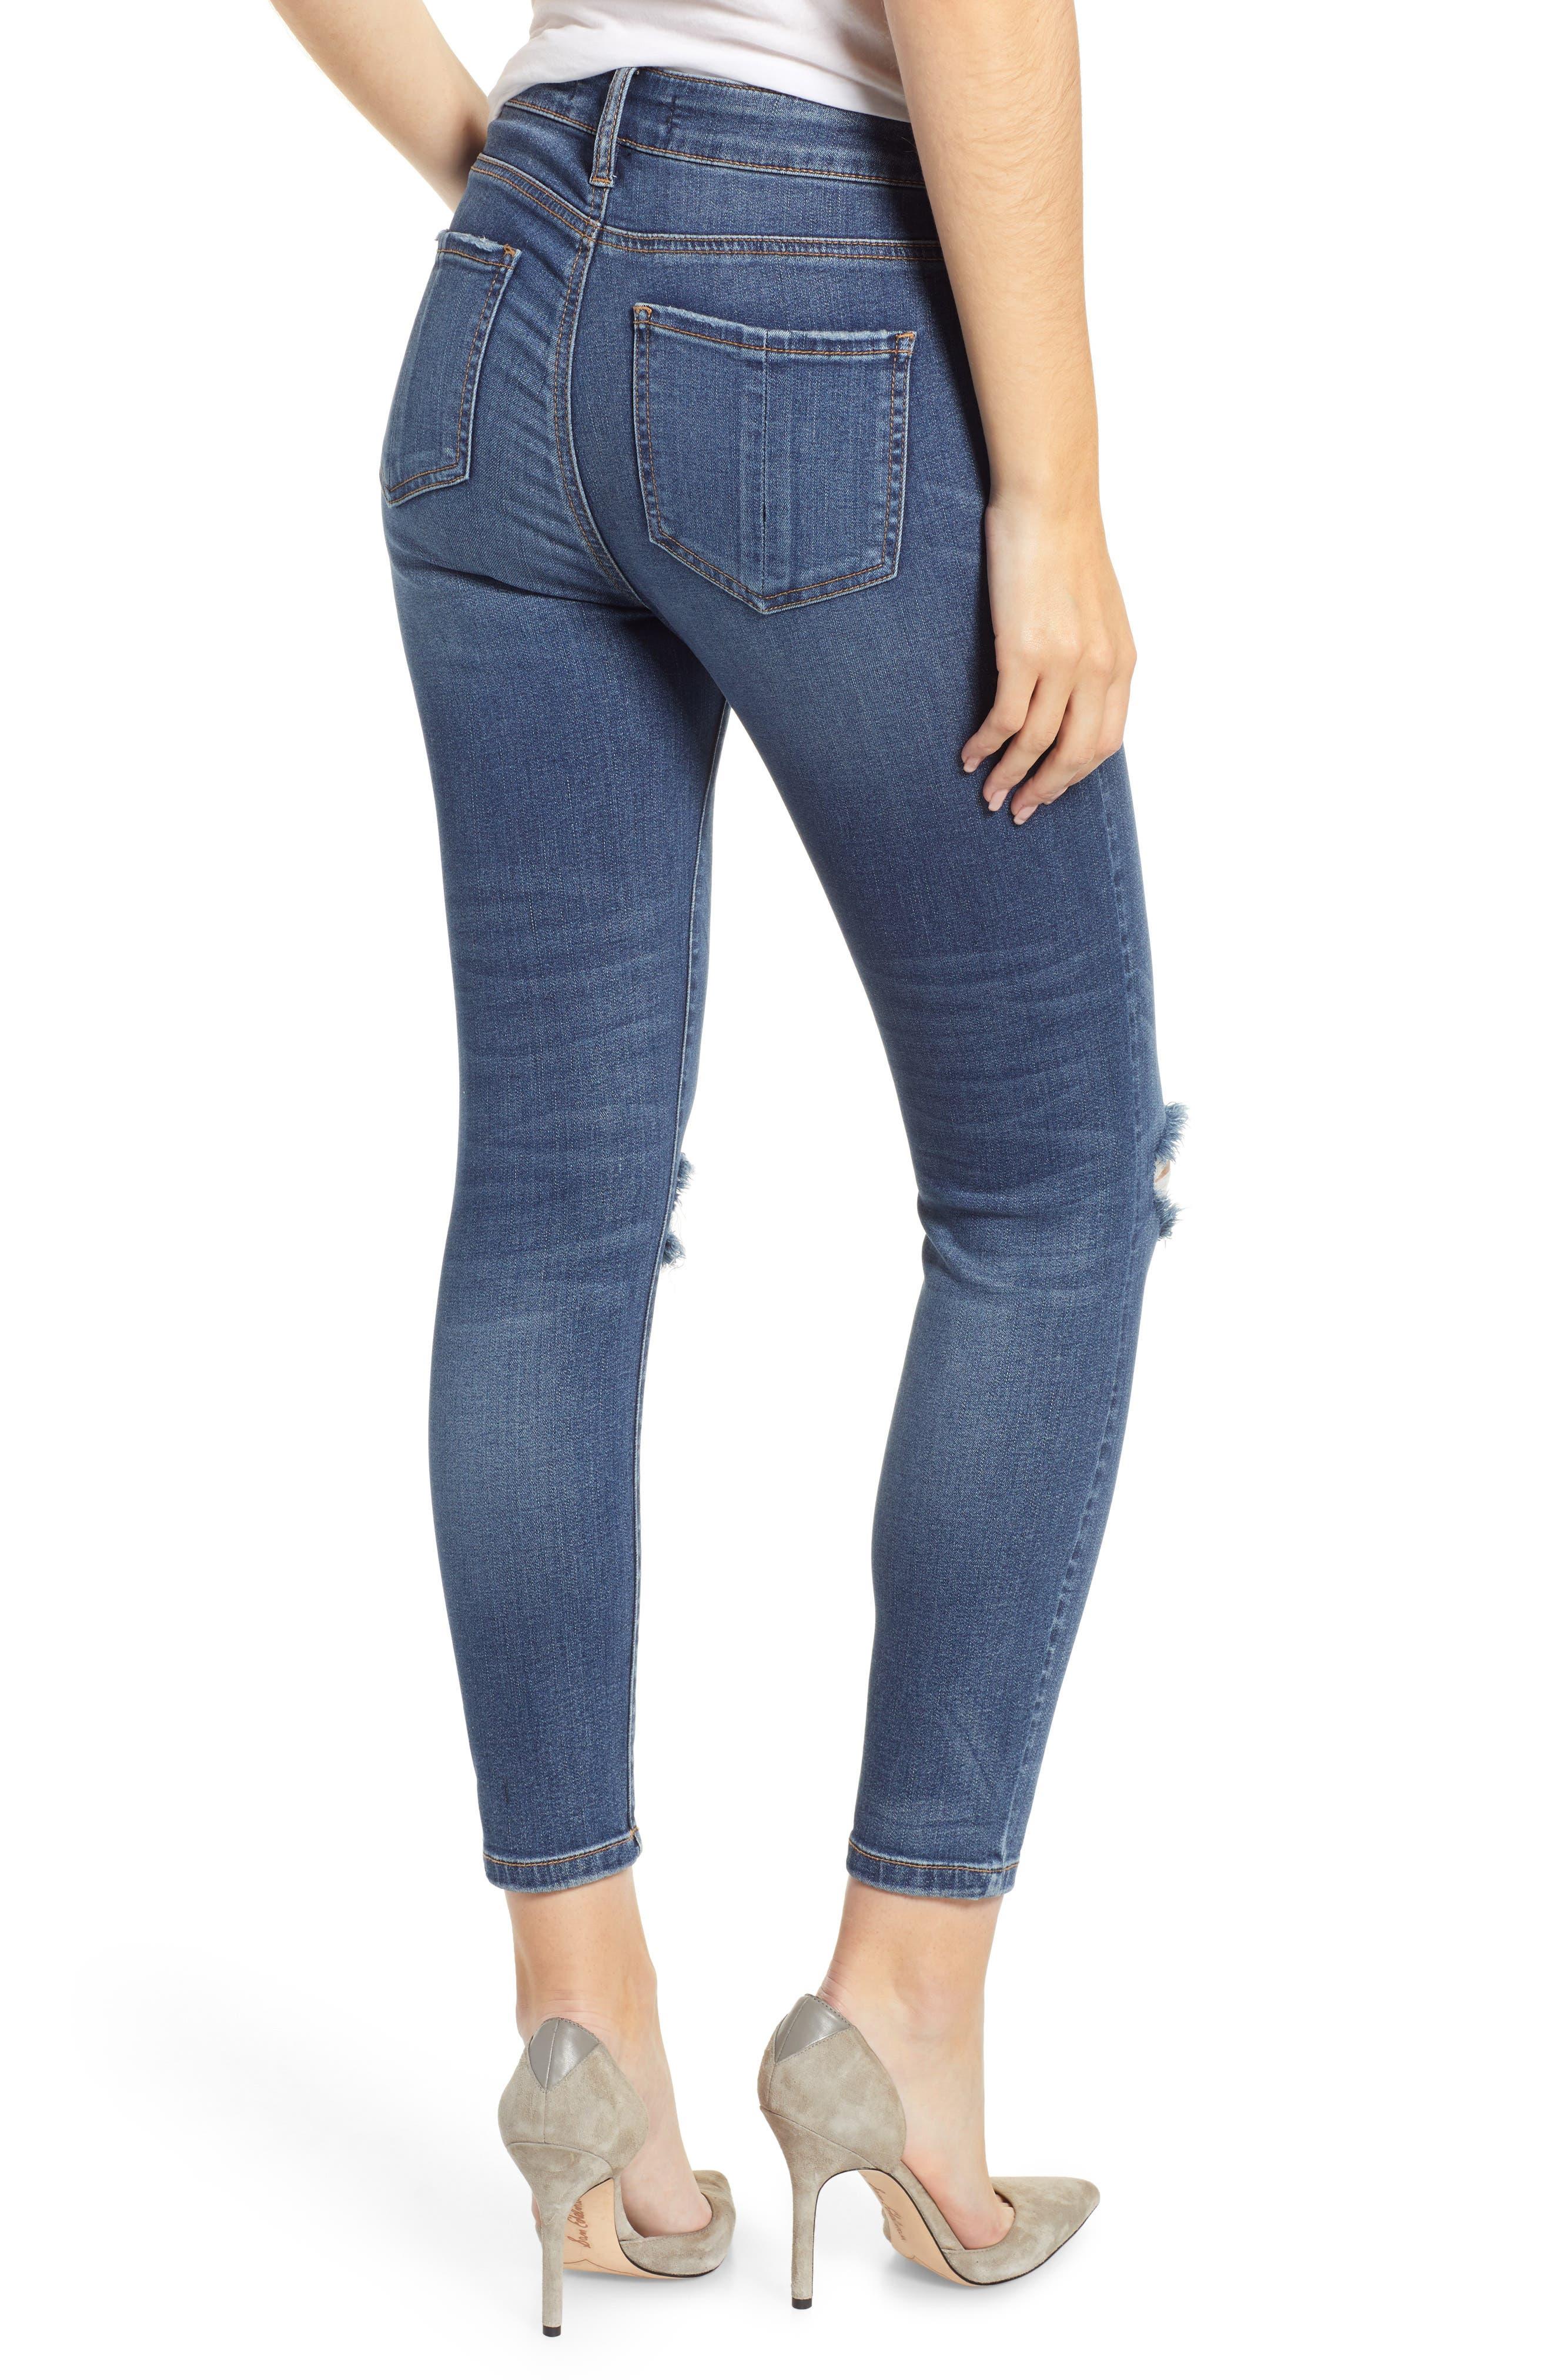 PROSPERITY DENIM,                             Ripped High Waist Skinny Jeans,                             Alternate thumbnail 2, color,                             RAYA WASH